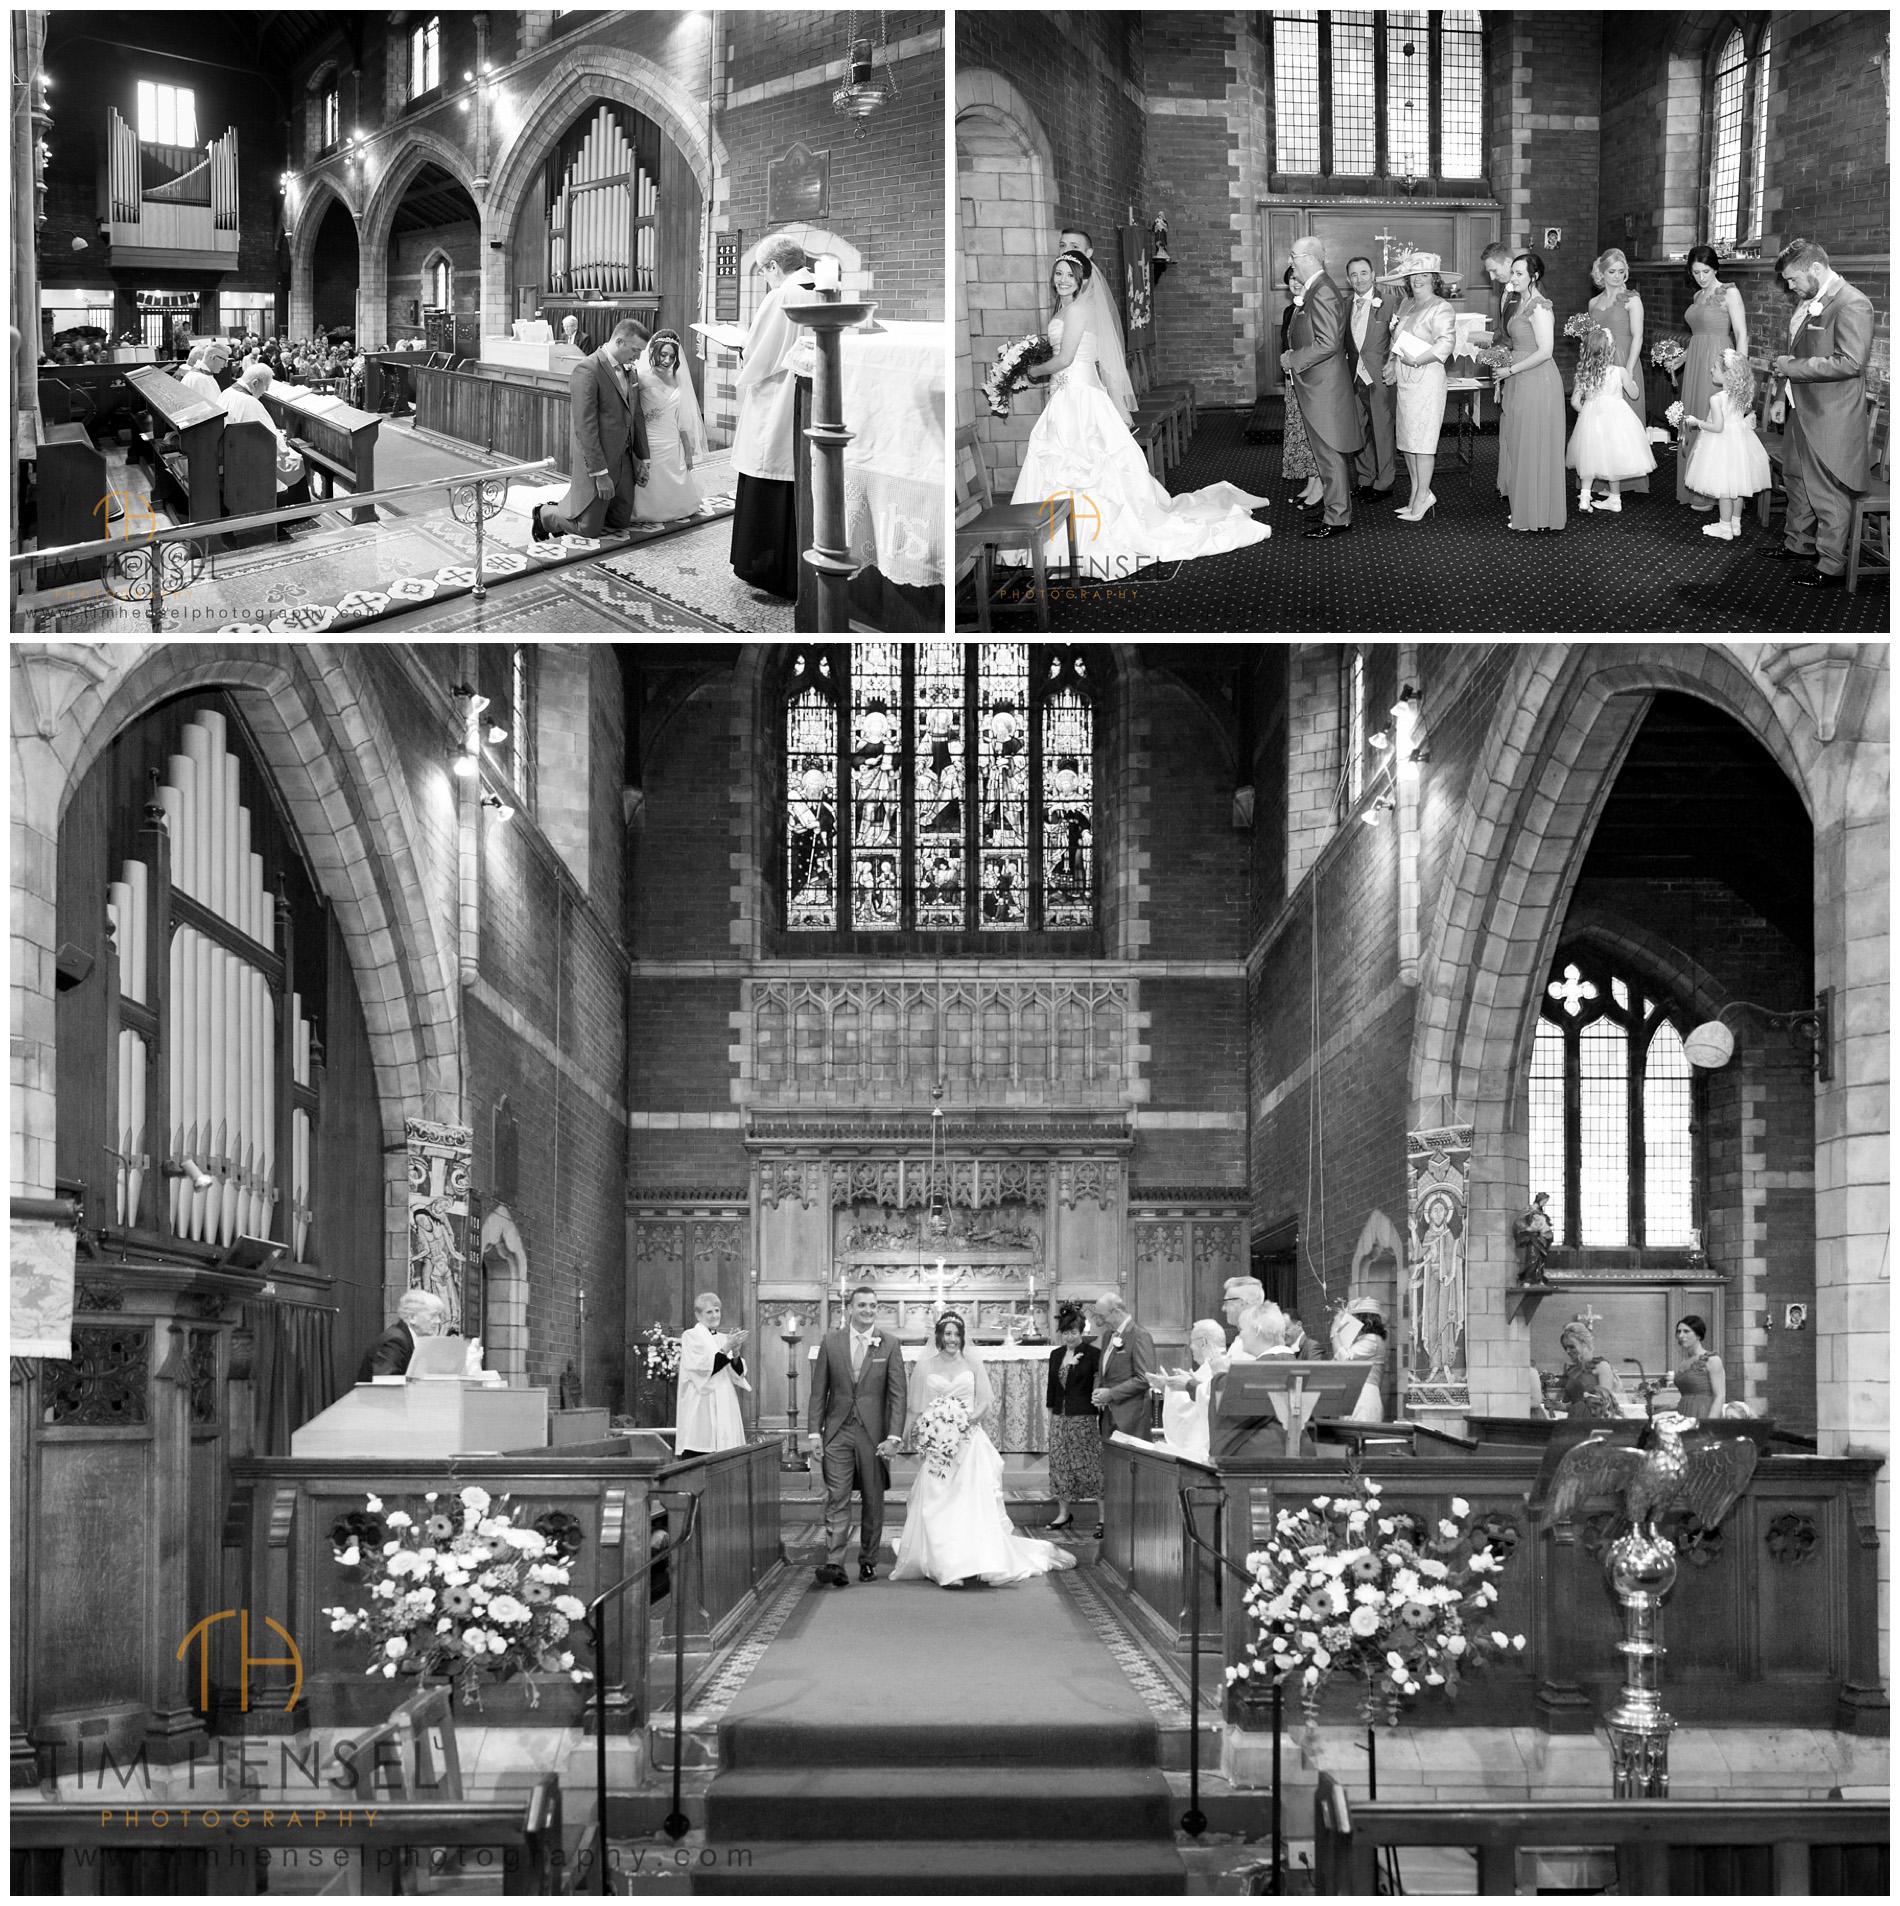 Wedding Ceremony photography in Cheshire